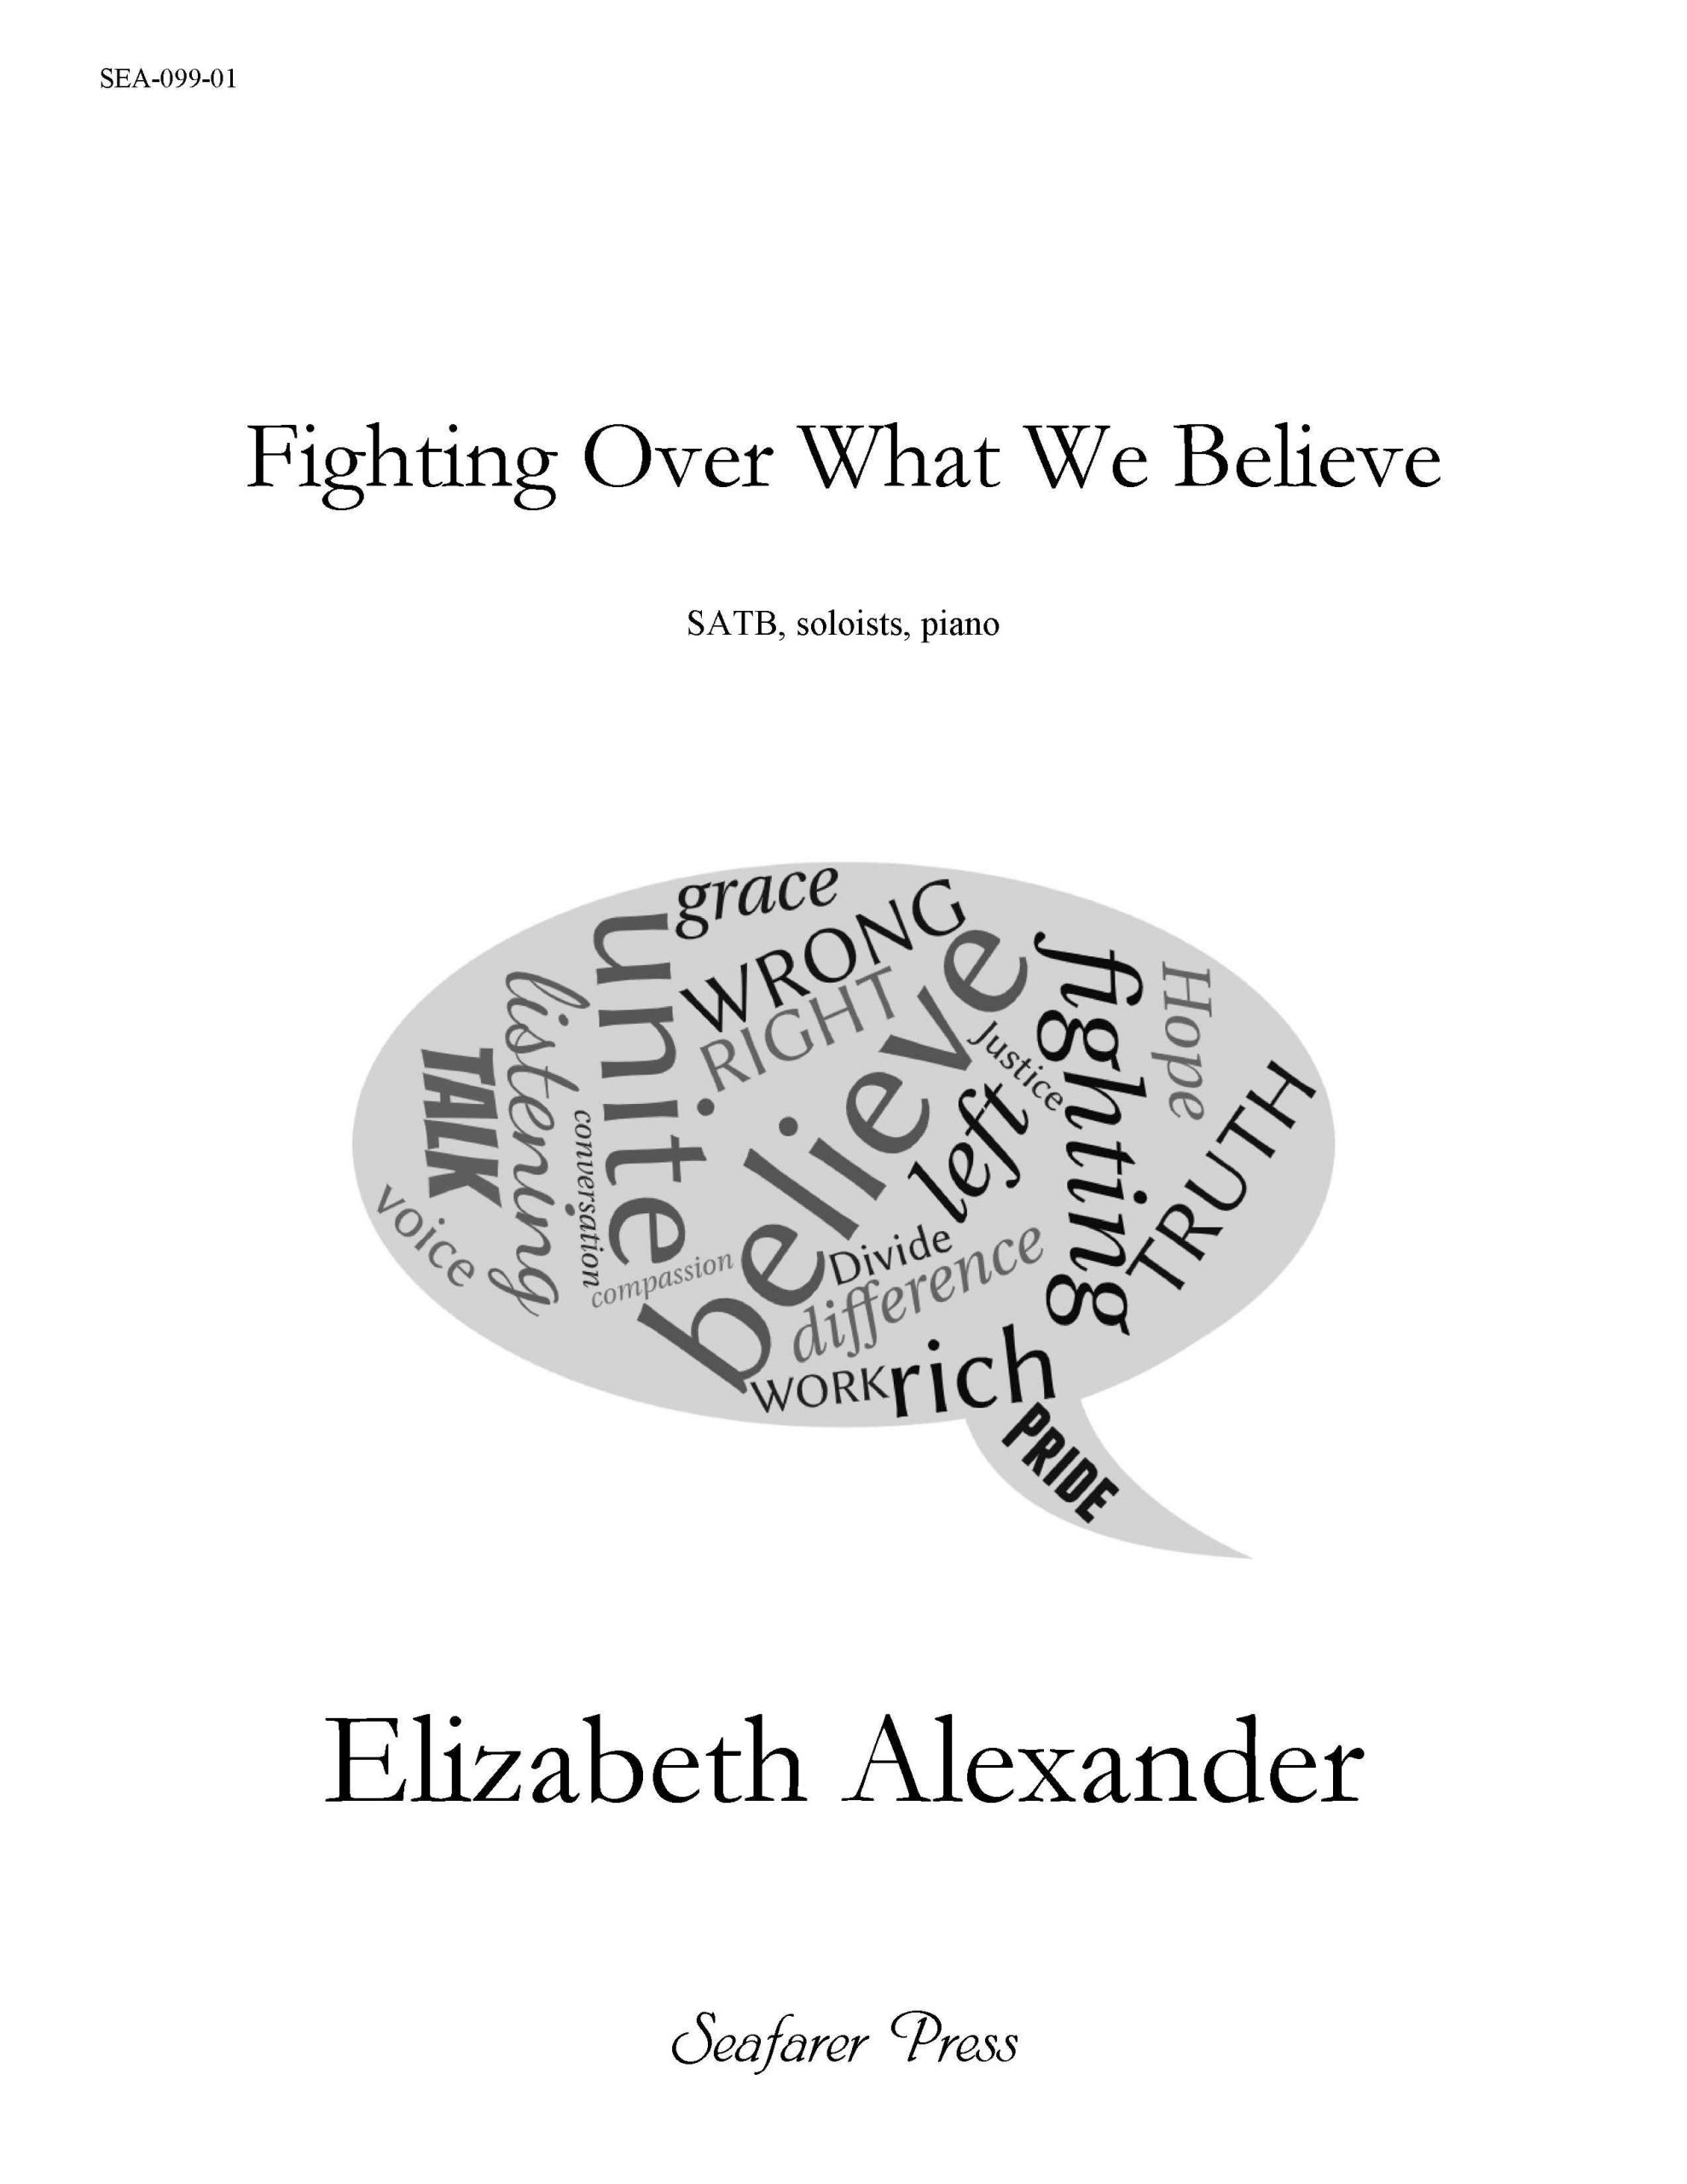 SEA-099-01 - Fighting Over What We Believe